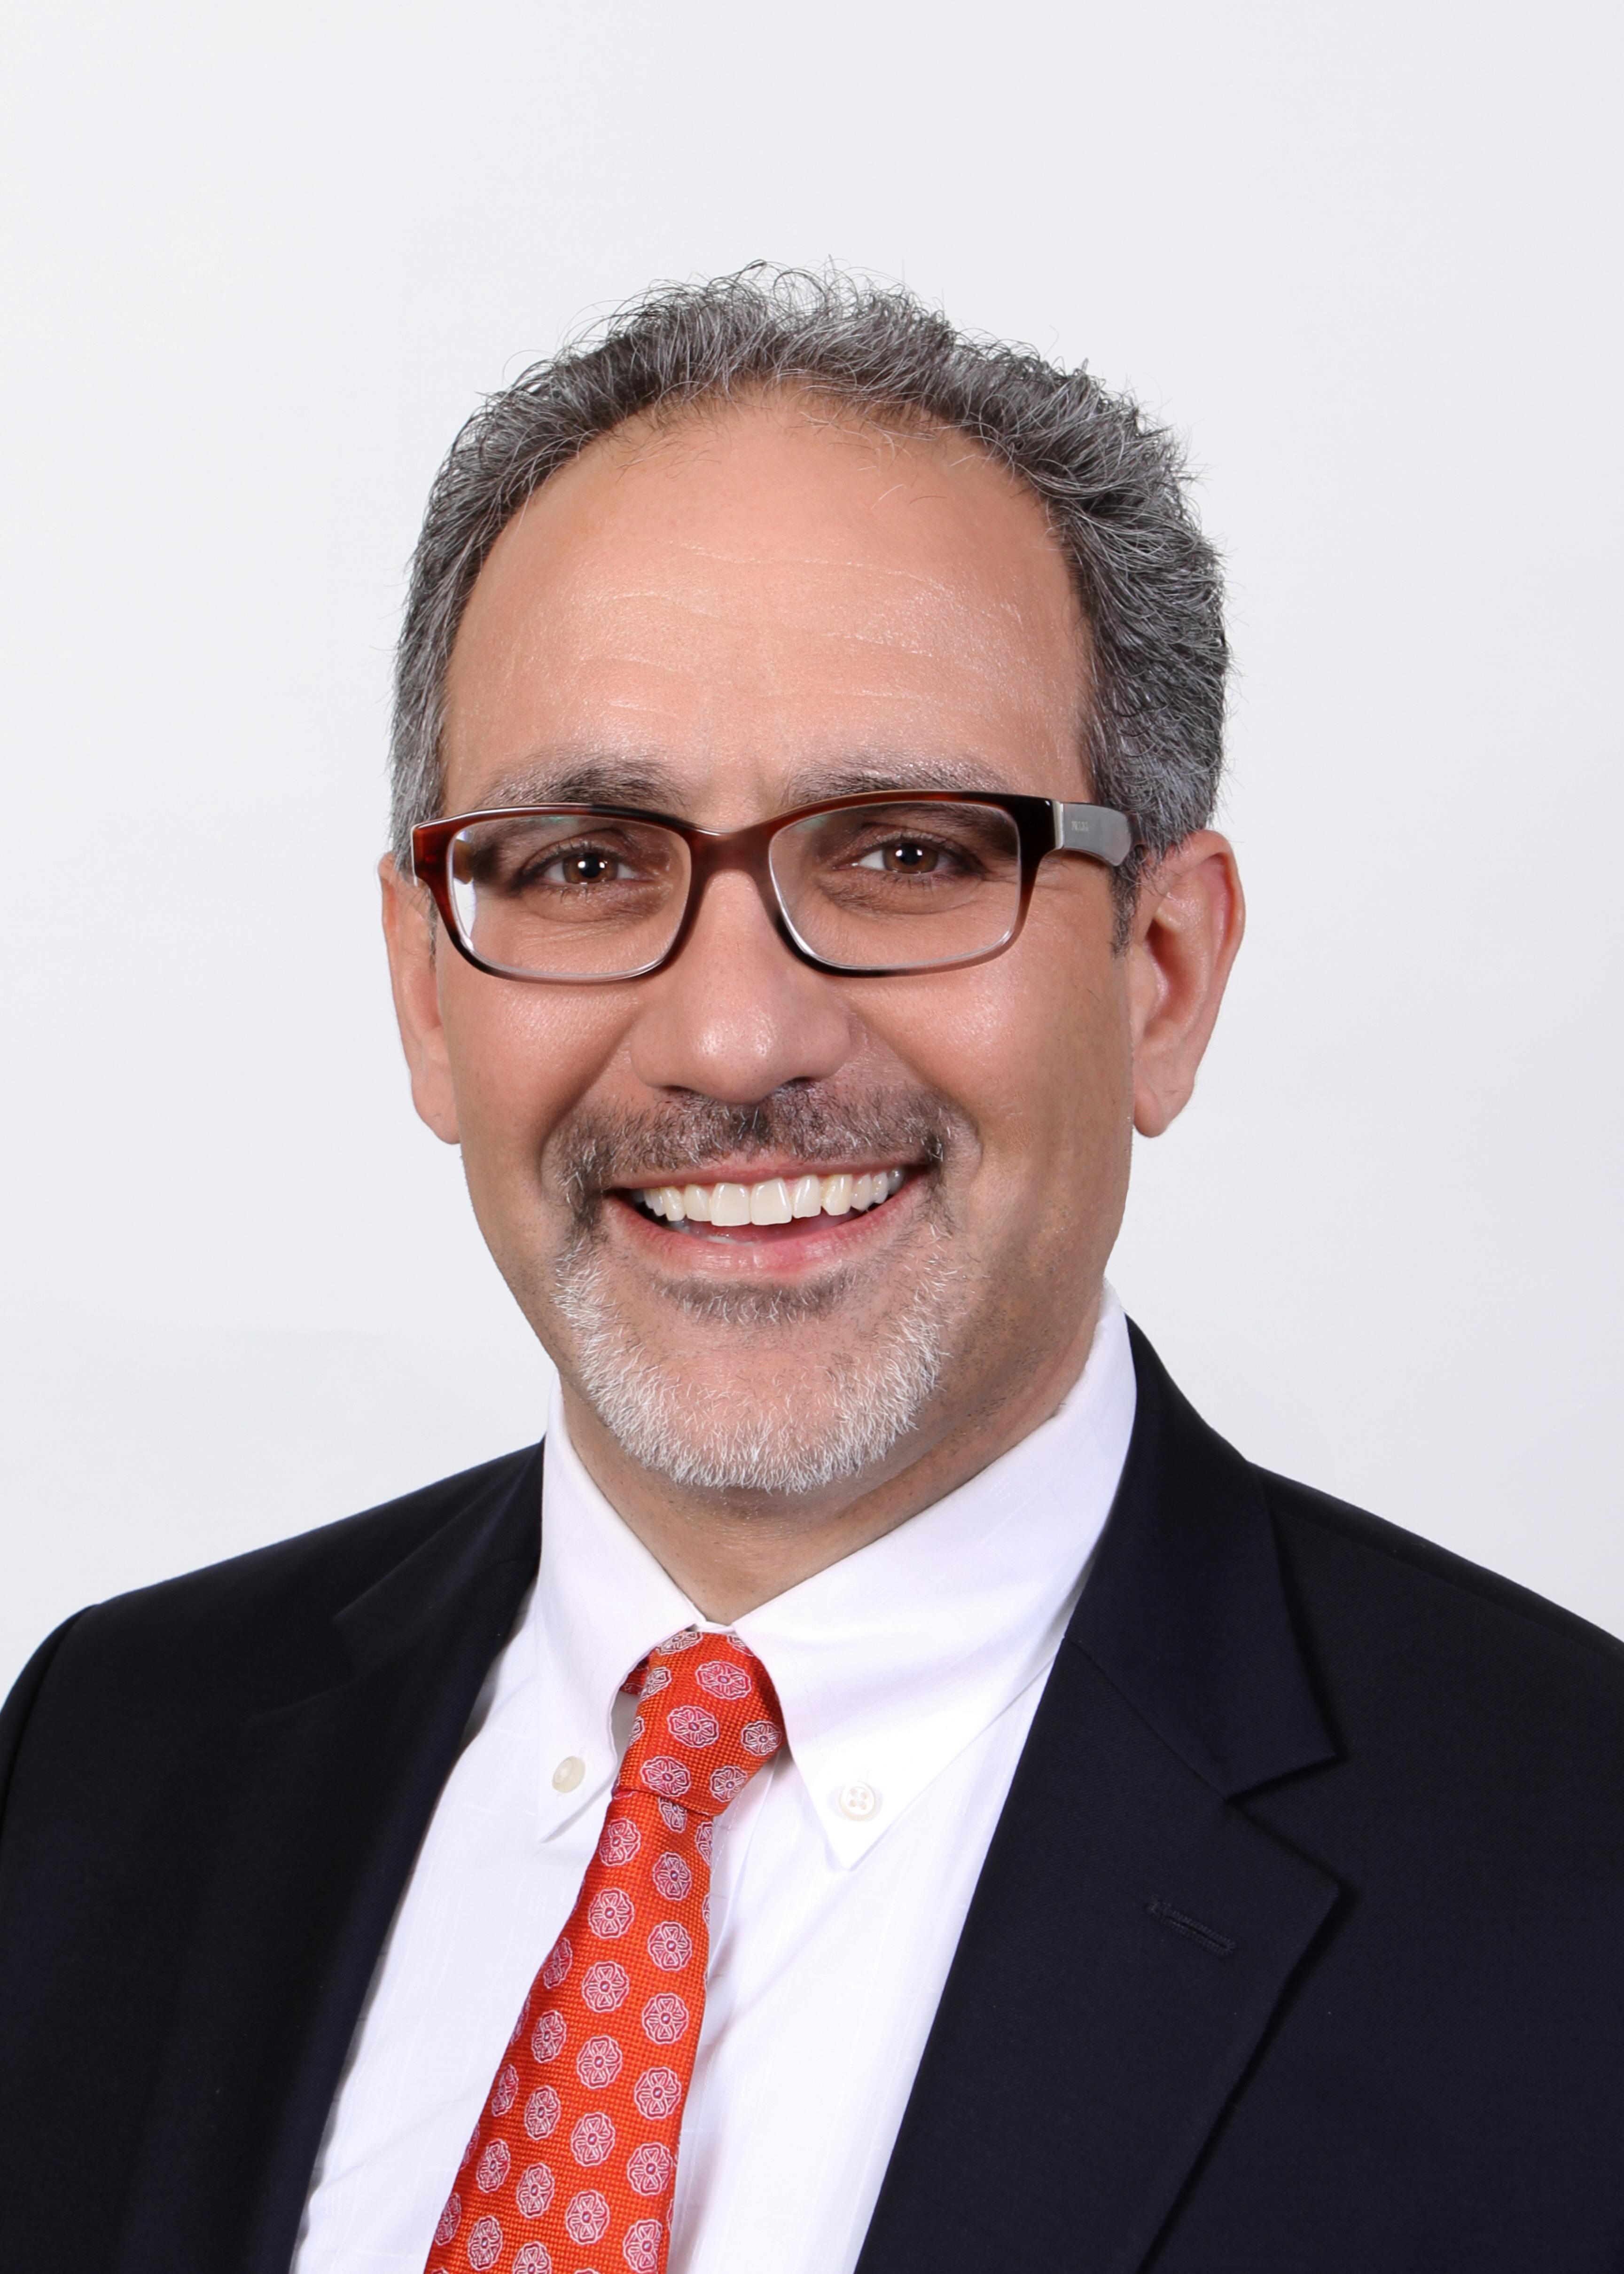 Moshe Benarroch, D.M.D., QME